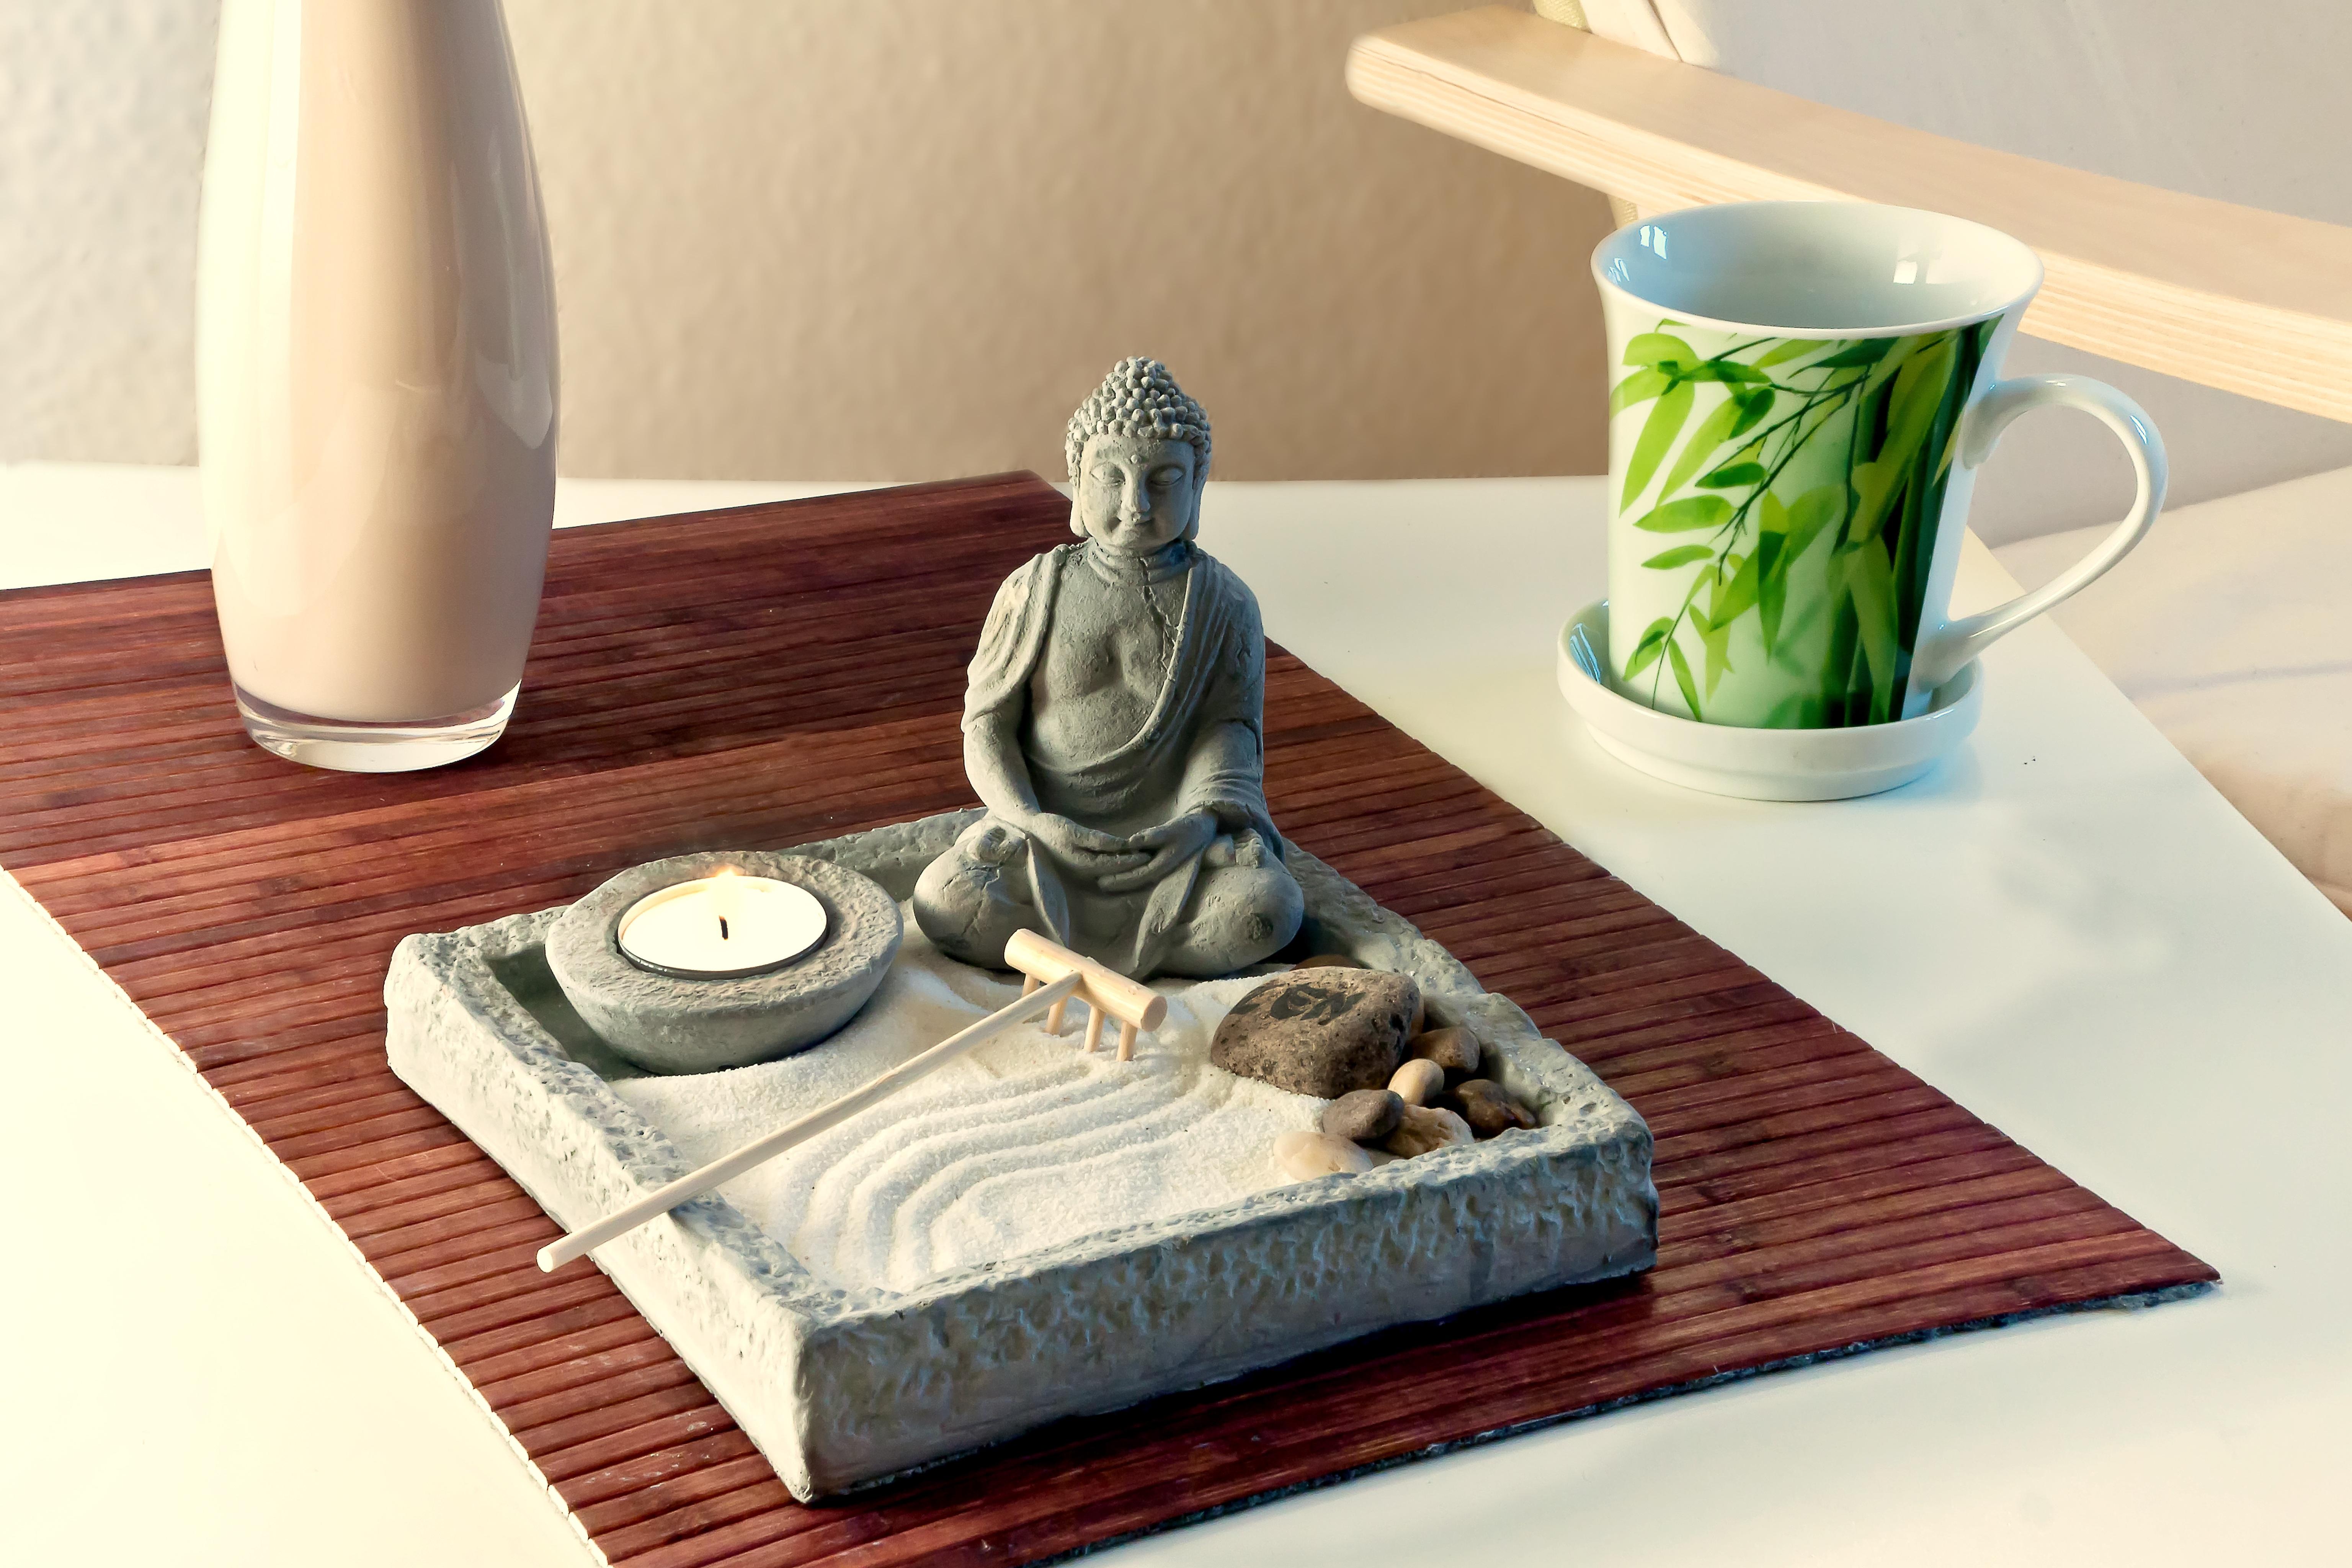 jardin zen japonais miniature intrieur mini jardin zen couleurs jardin pinterest minis creer un jardin - Creer Un Jardin Japonais Miniature